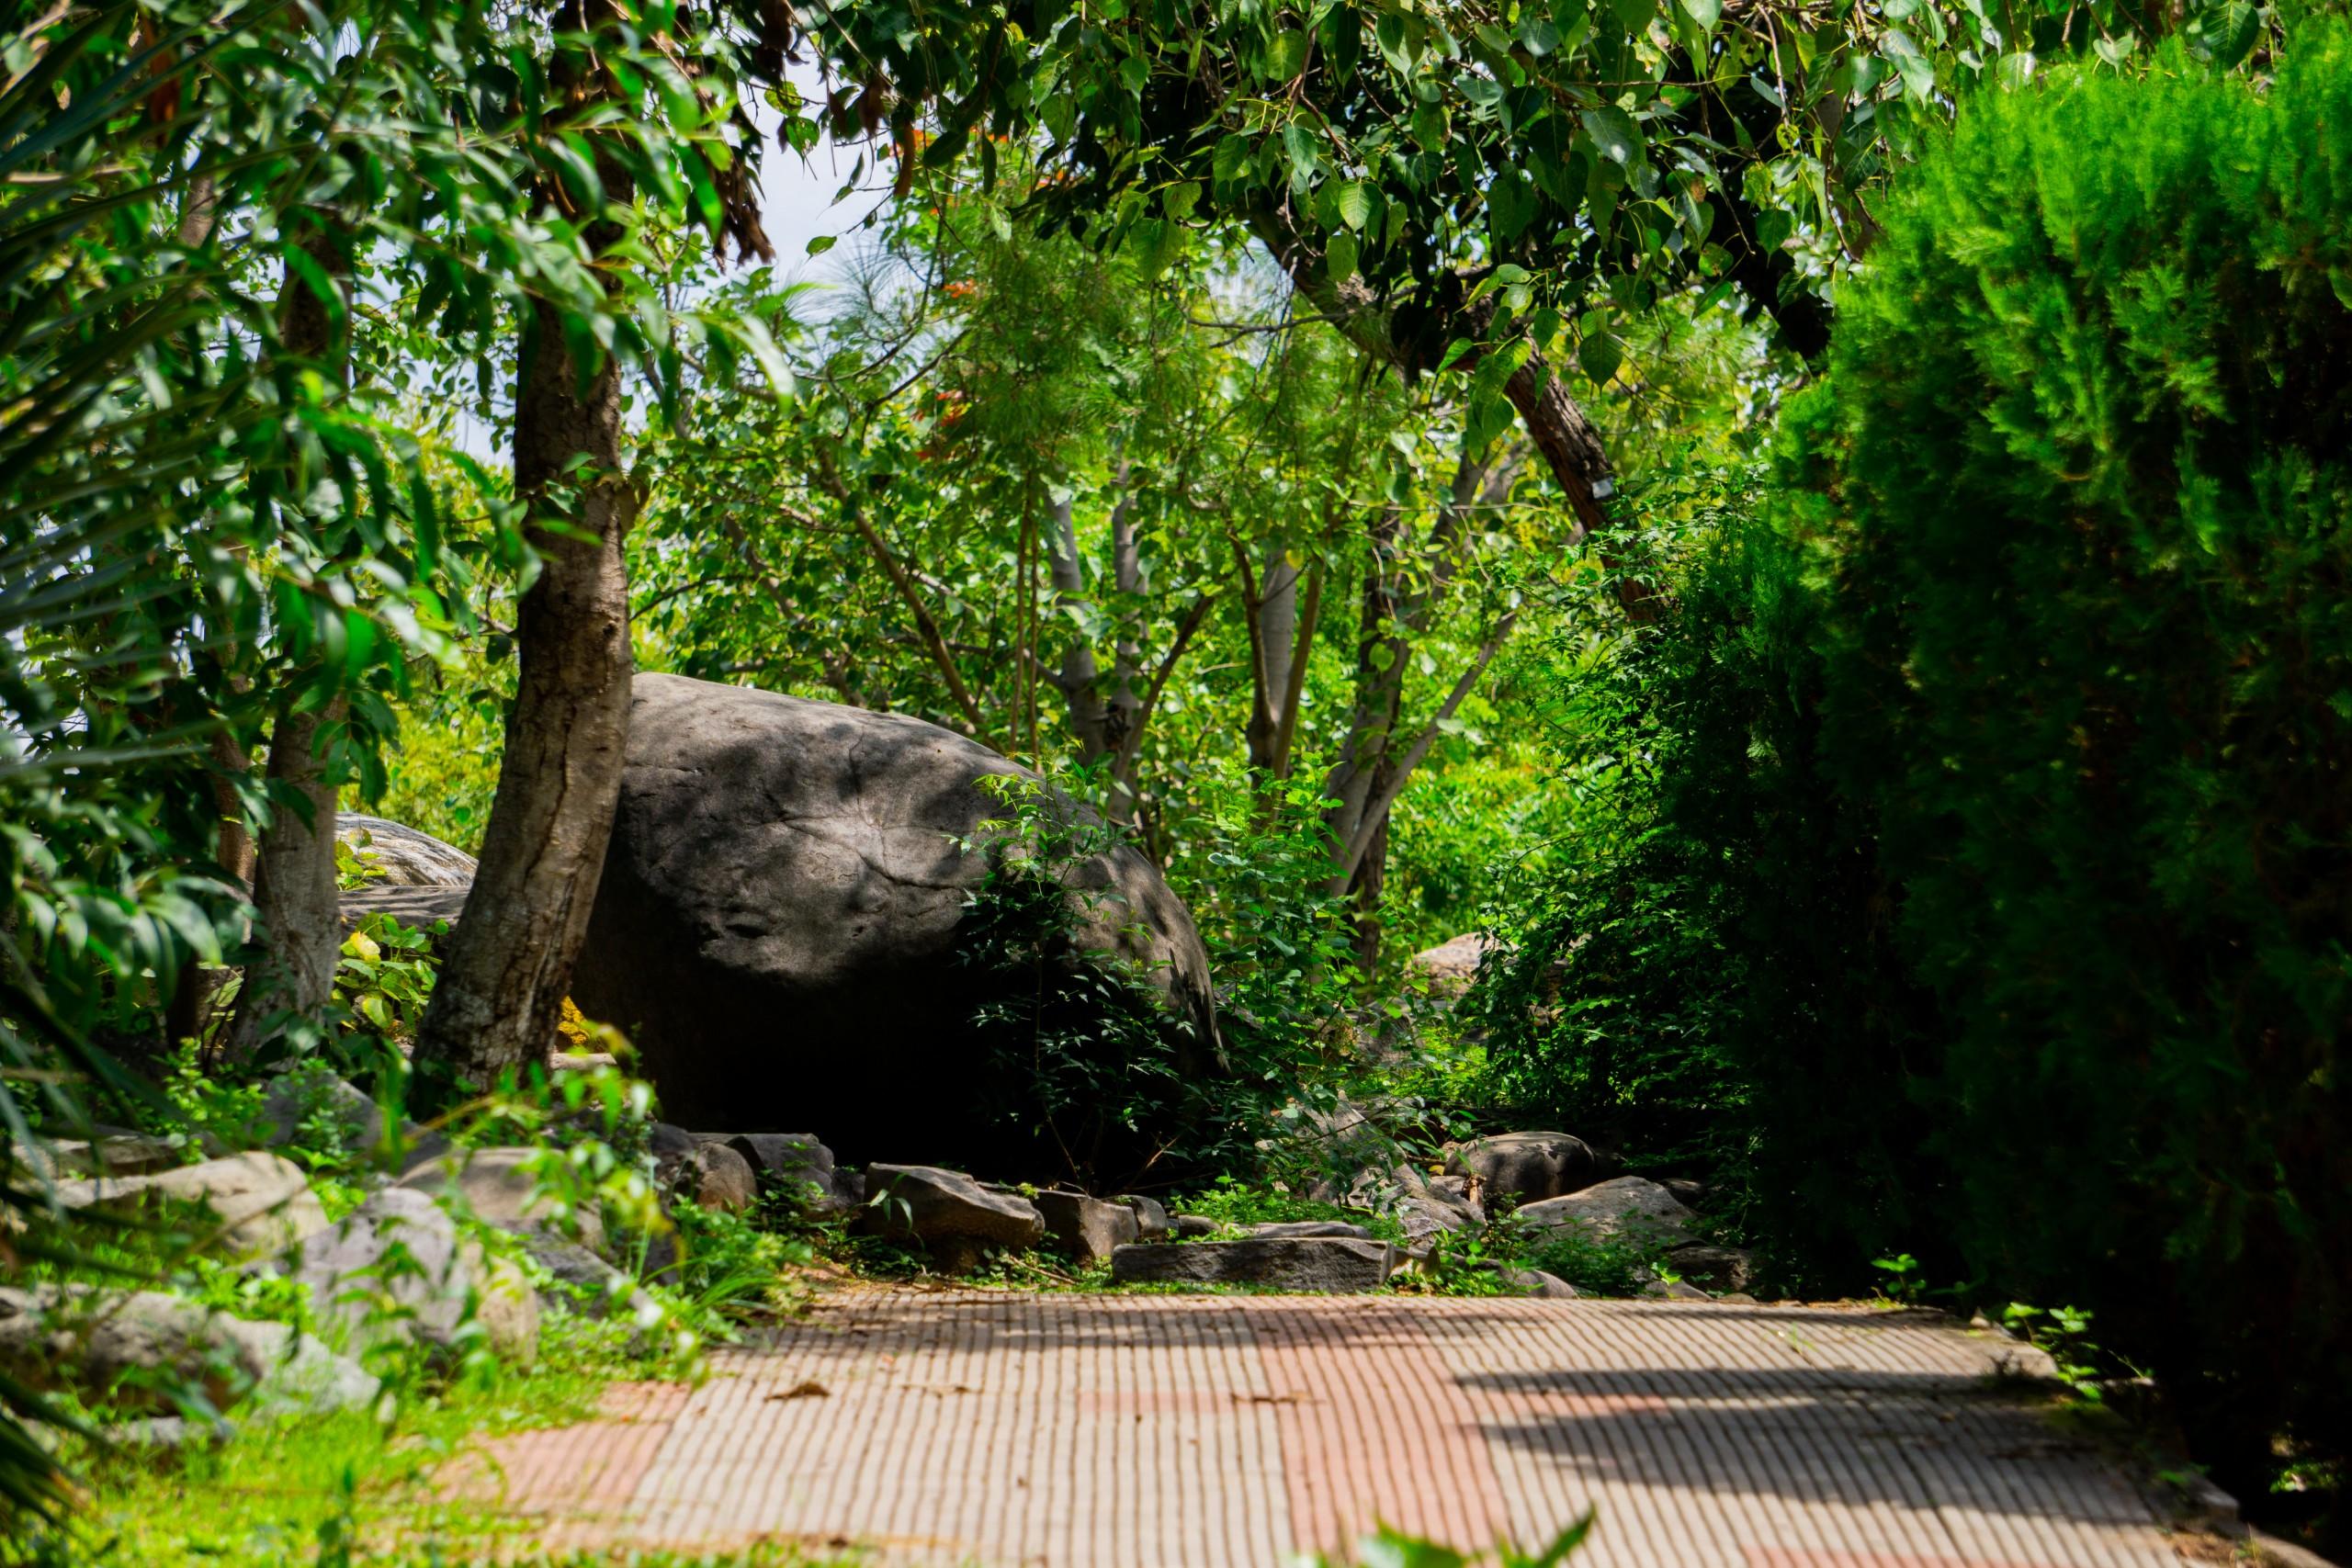 A path in dense greenery